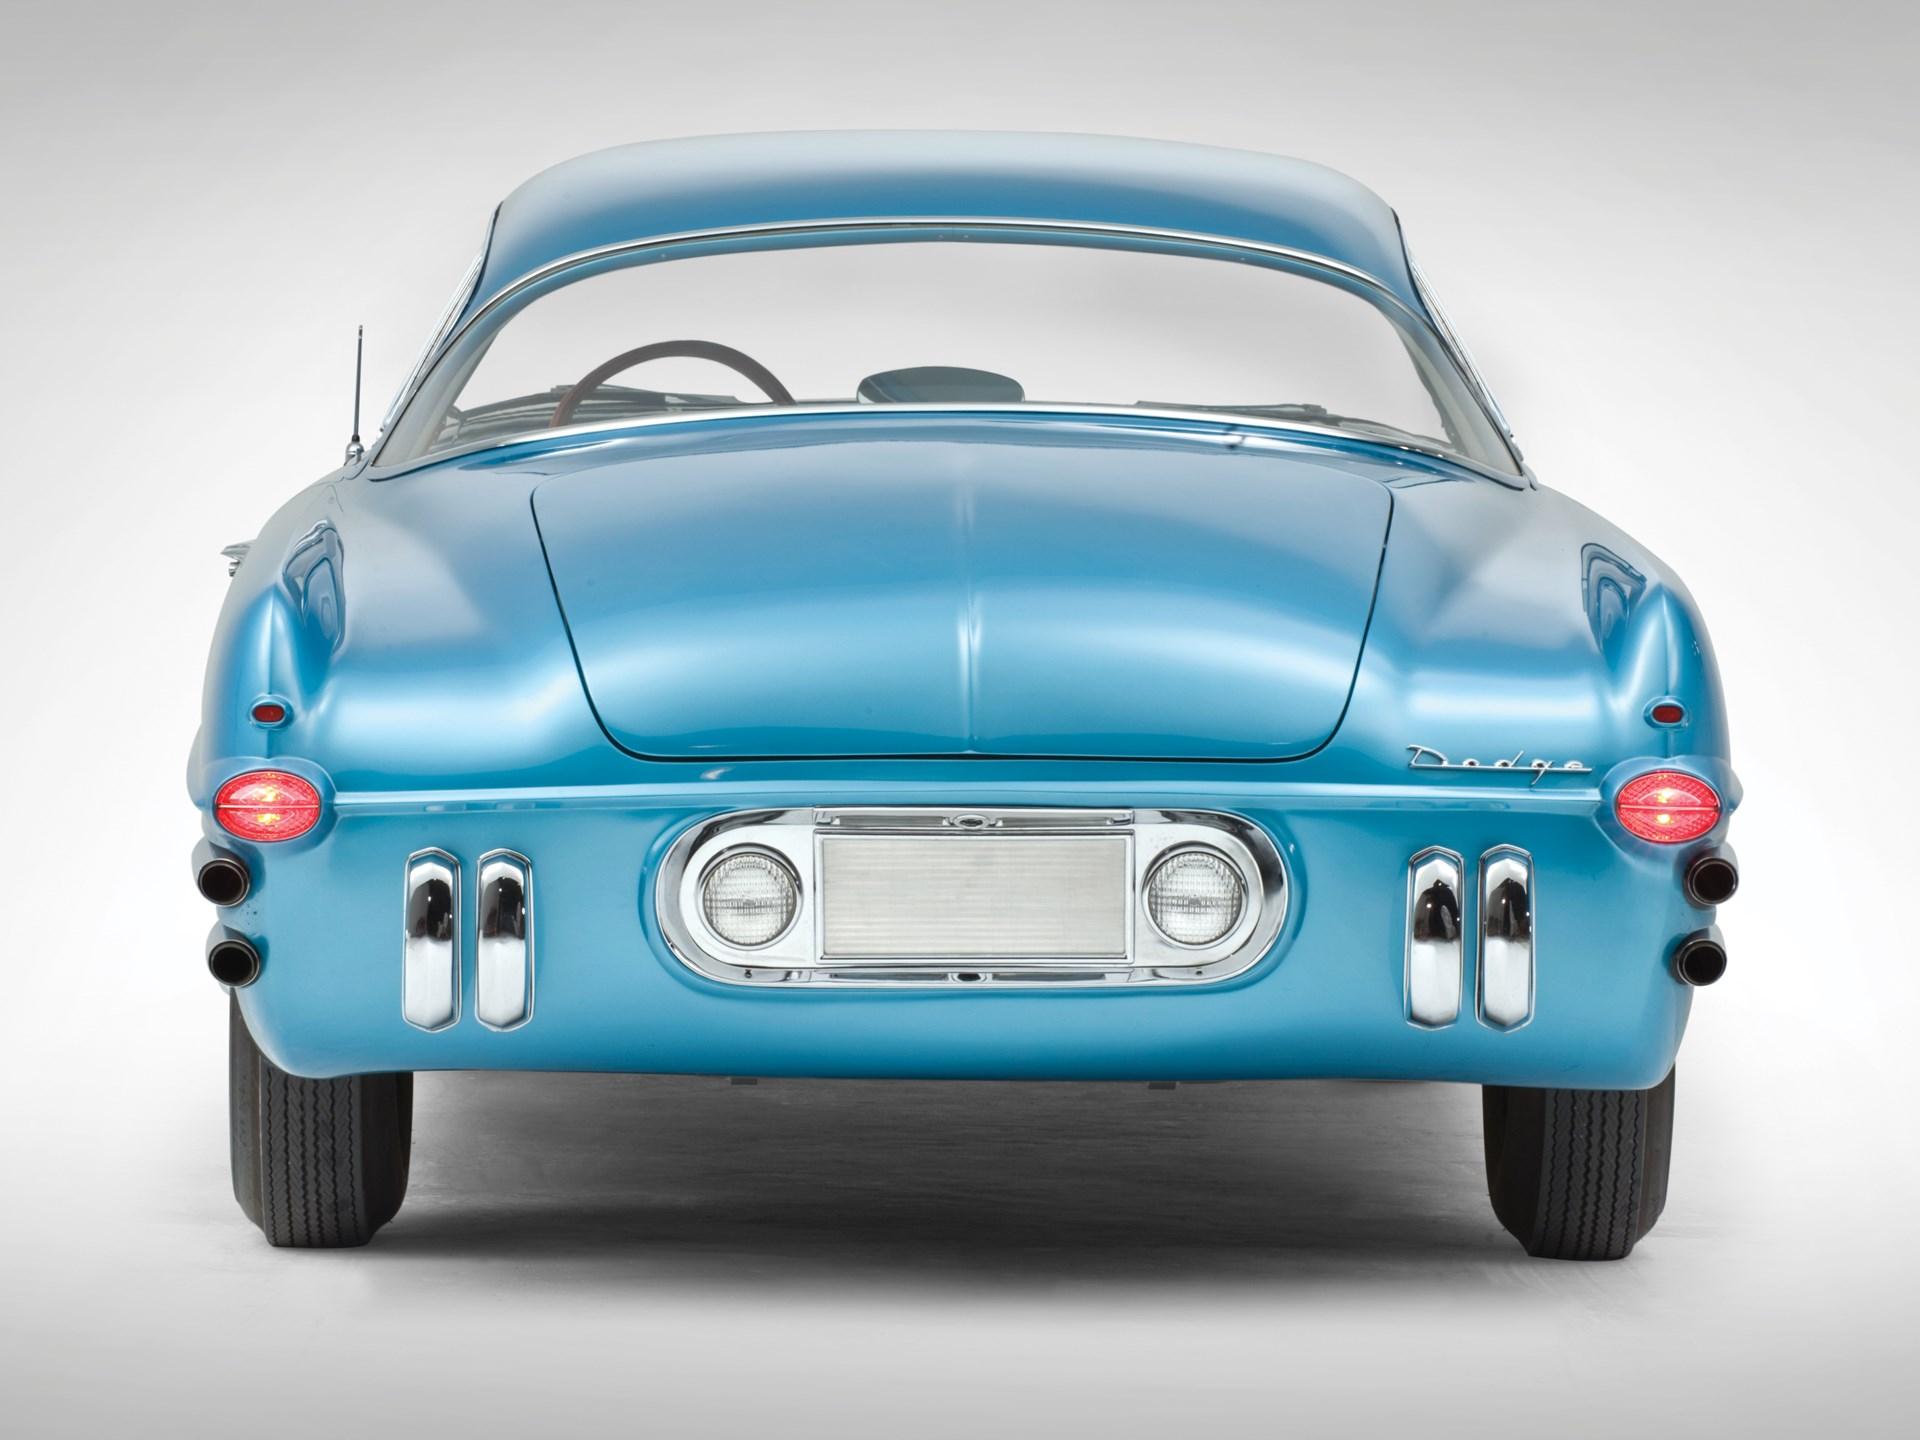 1954 Dodge Firearrow III Concept Car